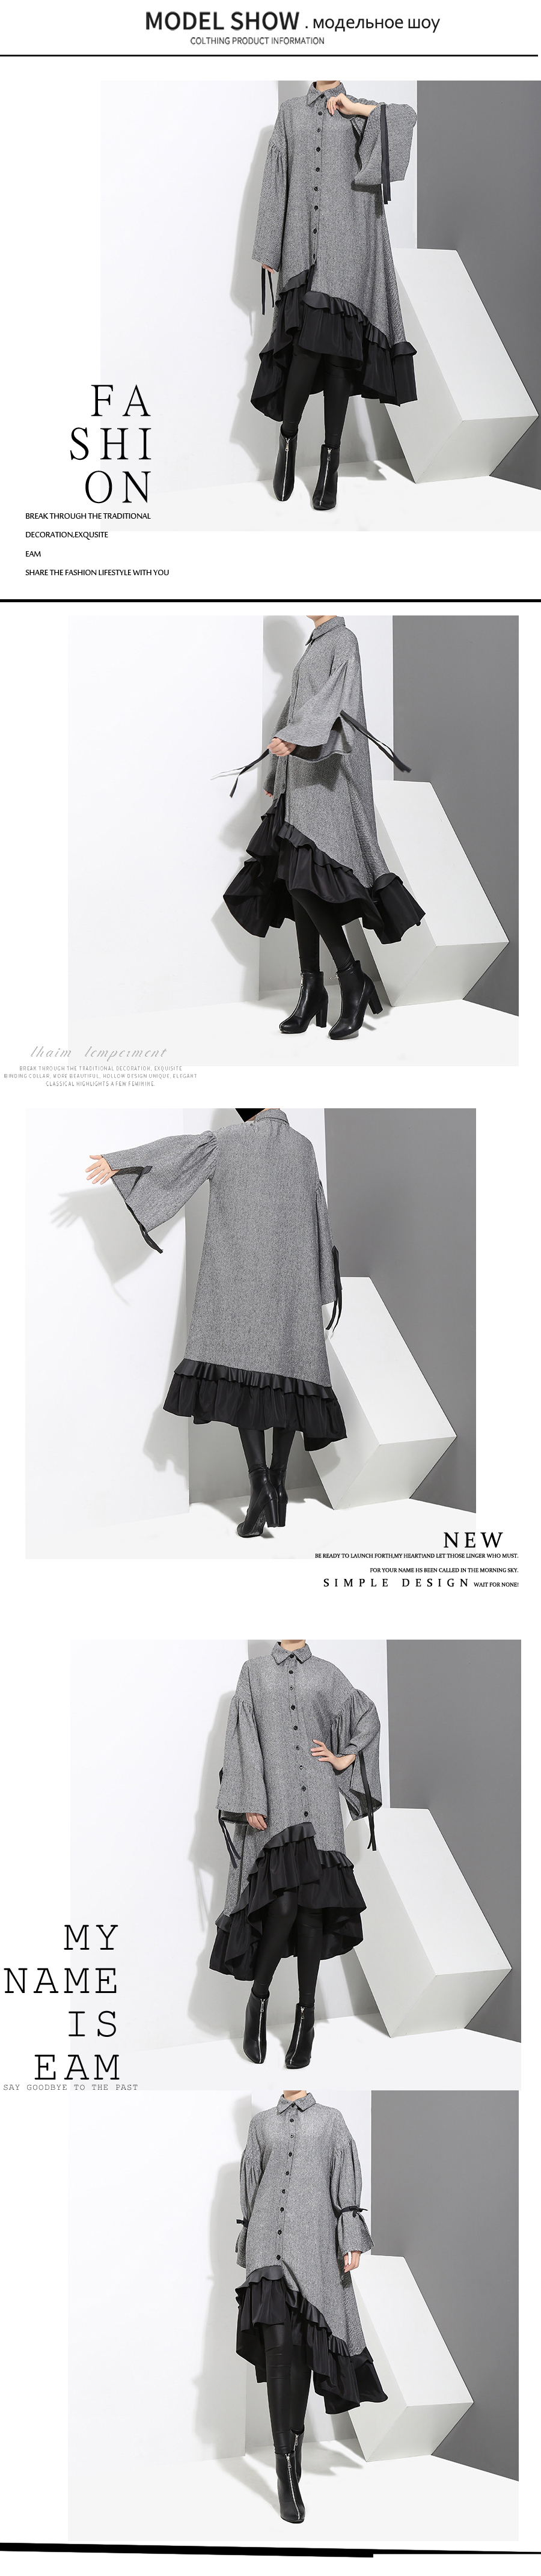 HTB1Gn2rjsj B1NjSZFHq6yDWpXaw - [EAM] 2019 New Spring Lapel Long Sleeve  Bandage Solid Color Gray Big Hem Irregular Loose Dress Women Fashion Tide JD717